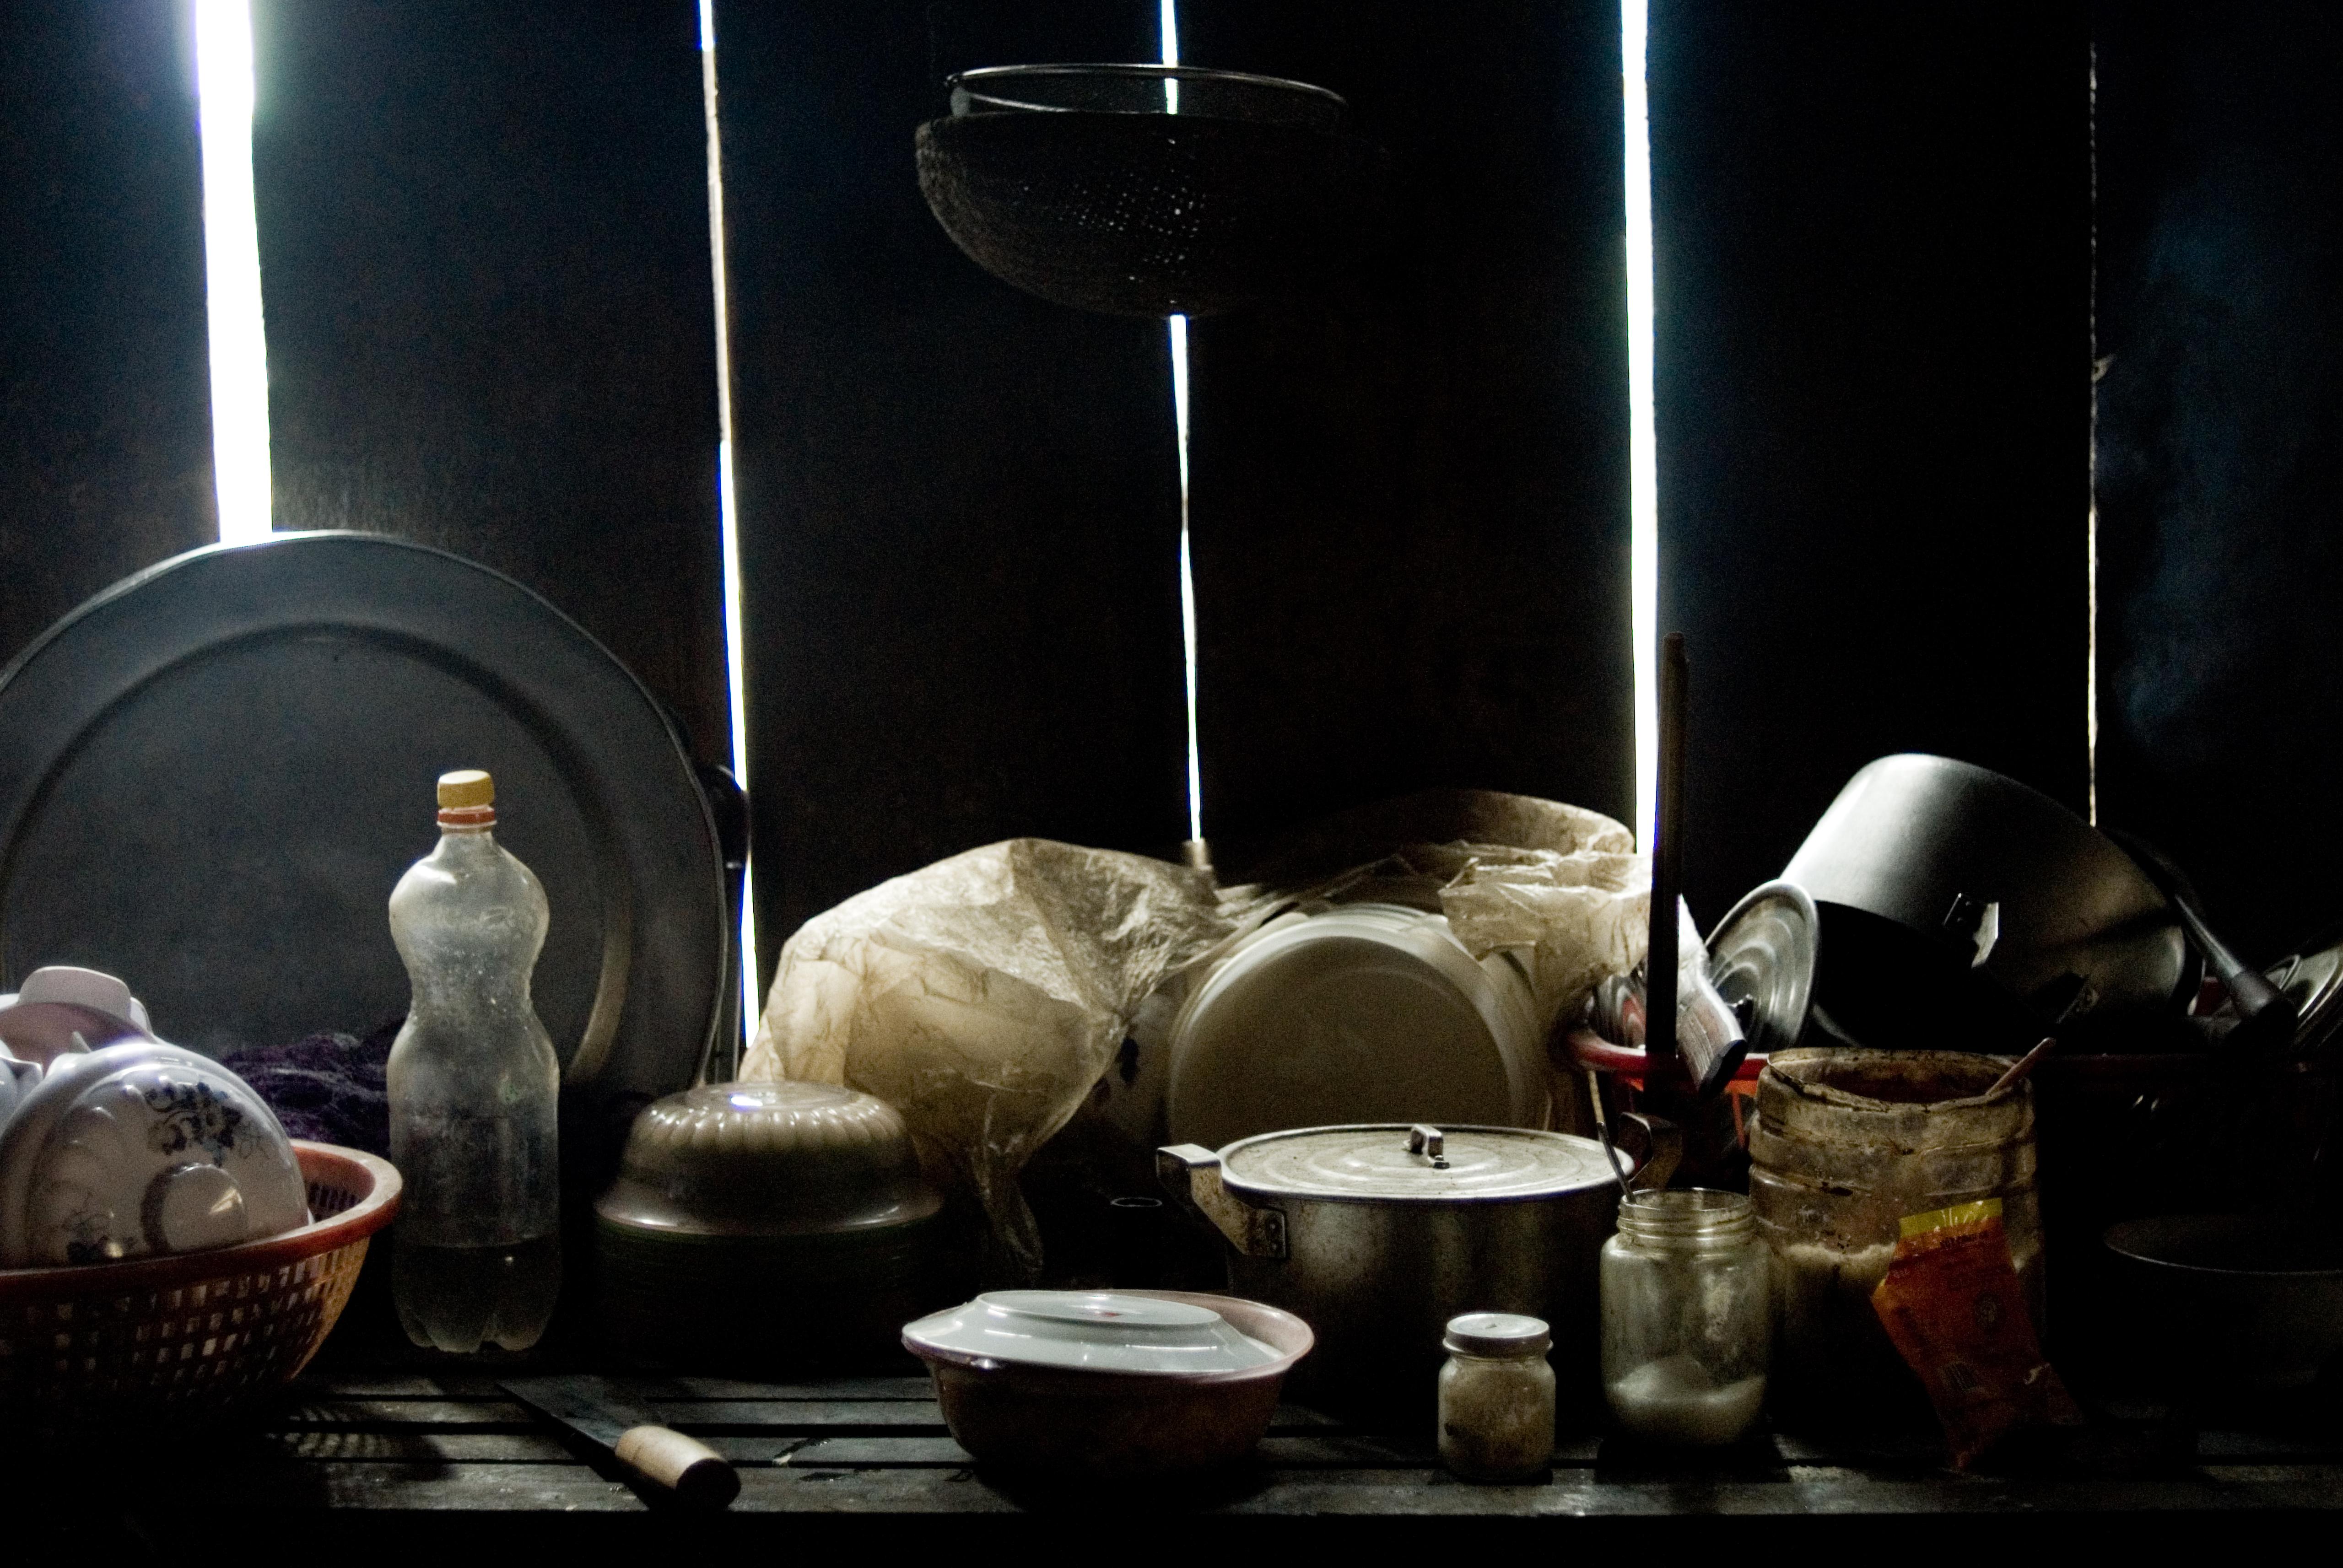 Rustic vietnamese kitchen